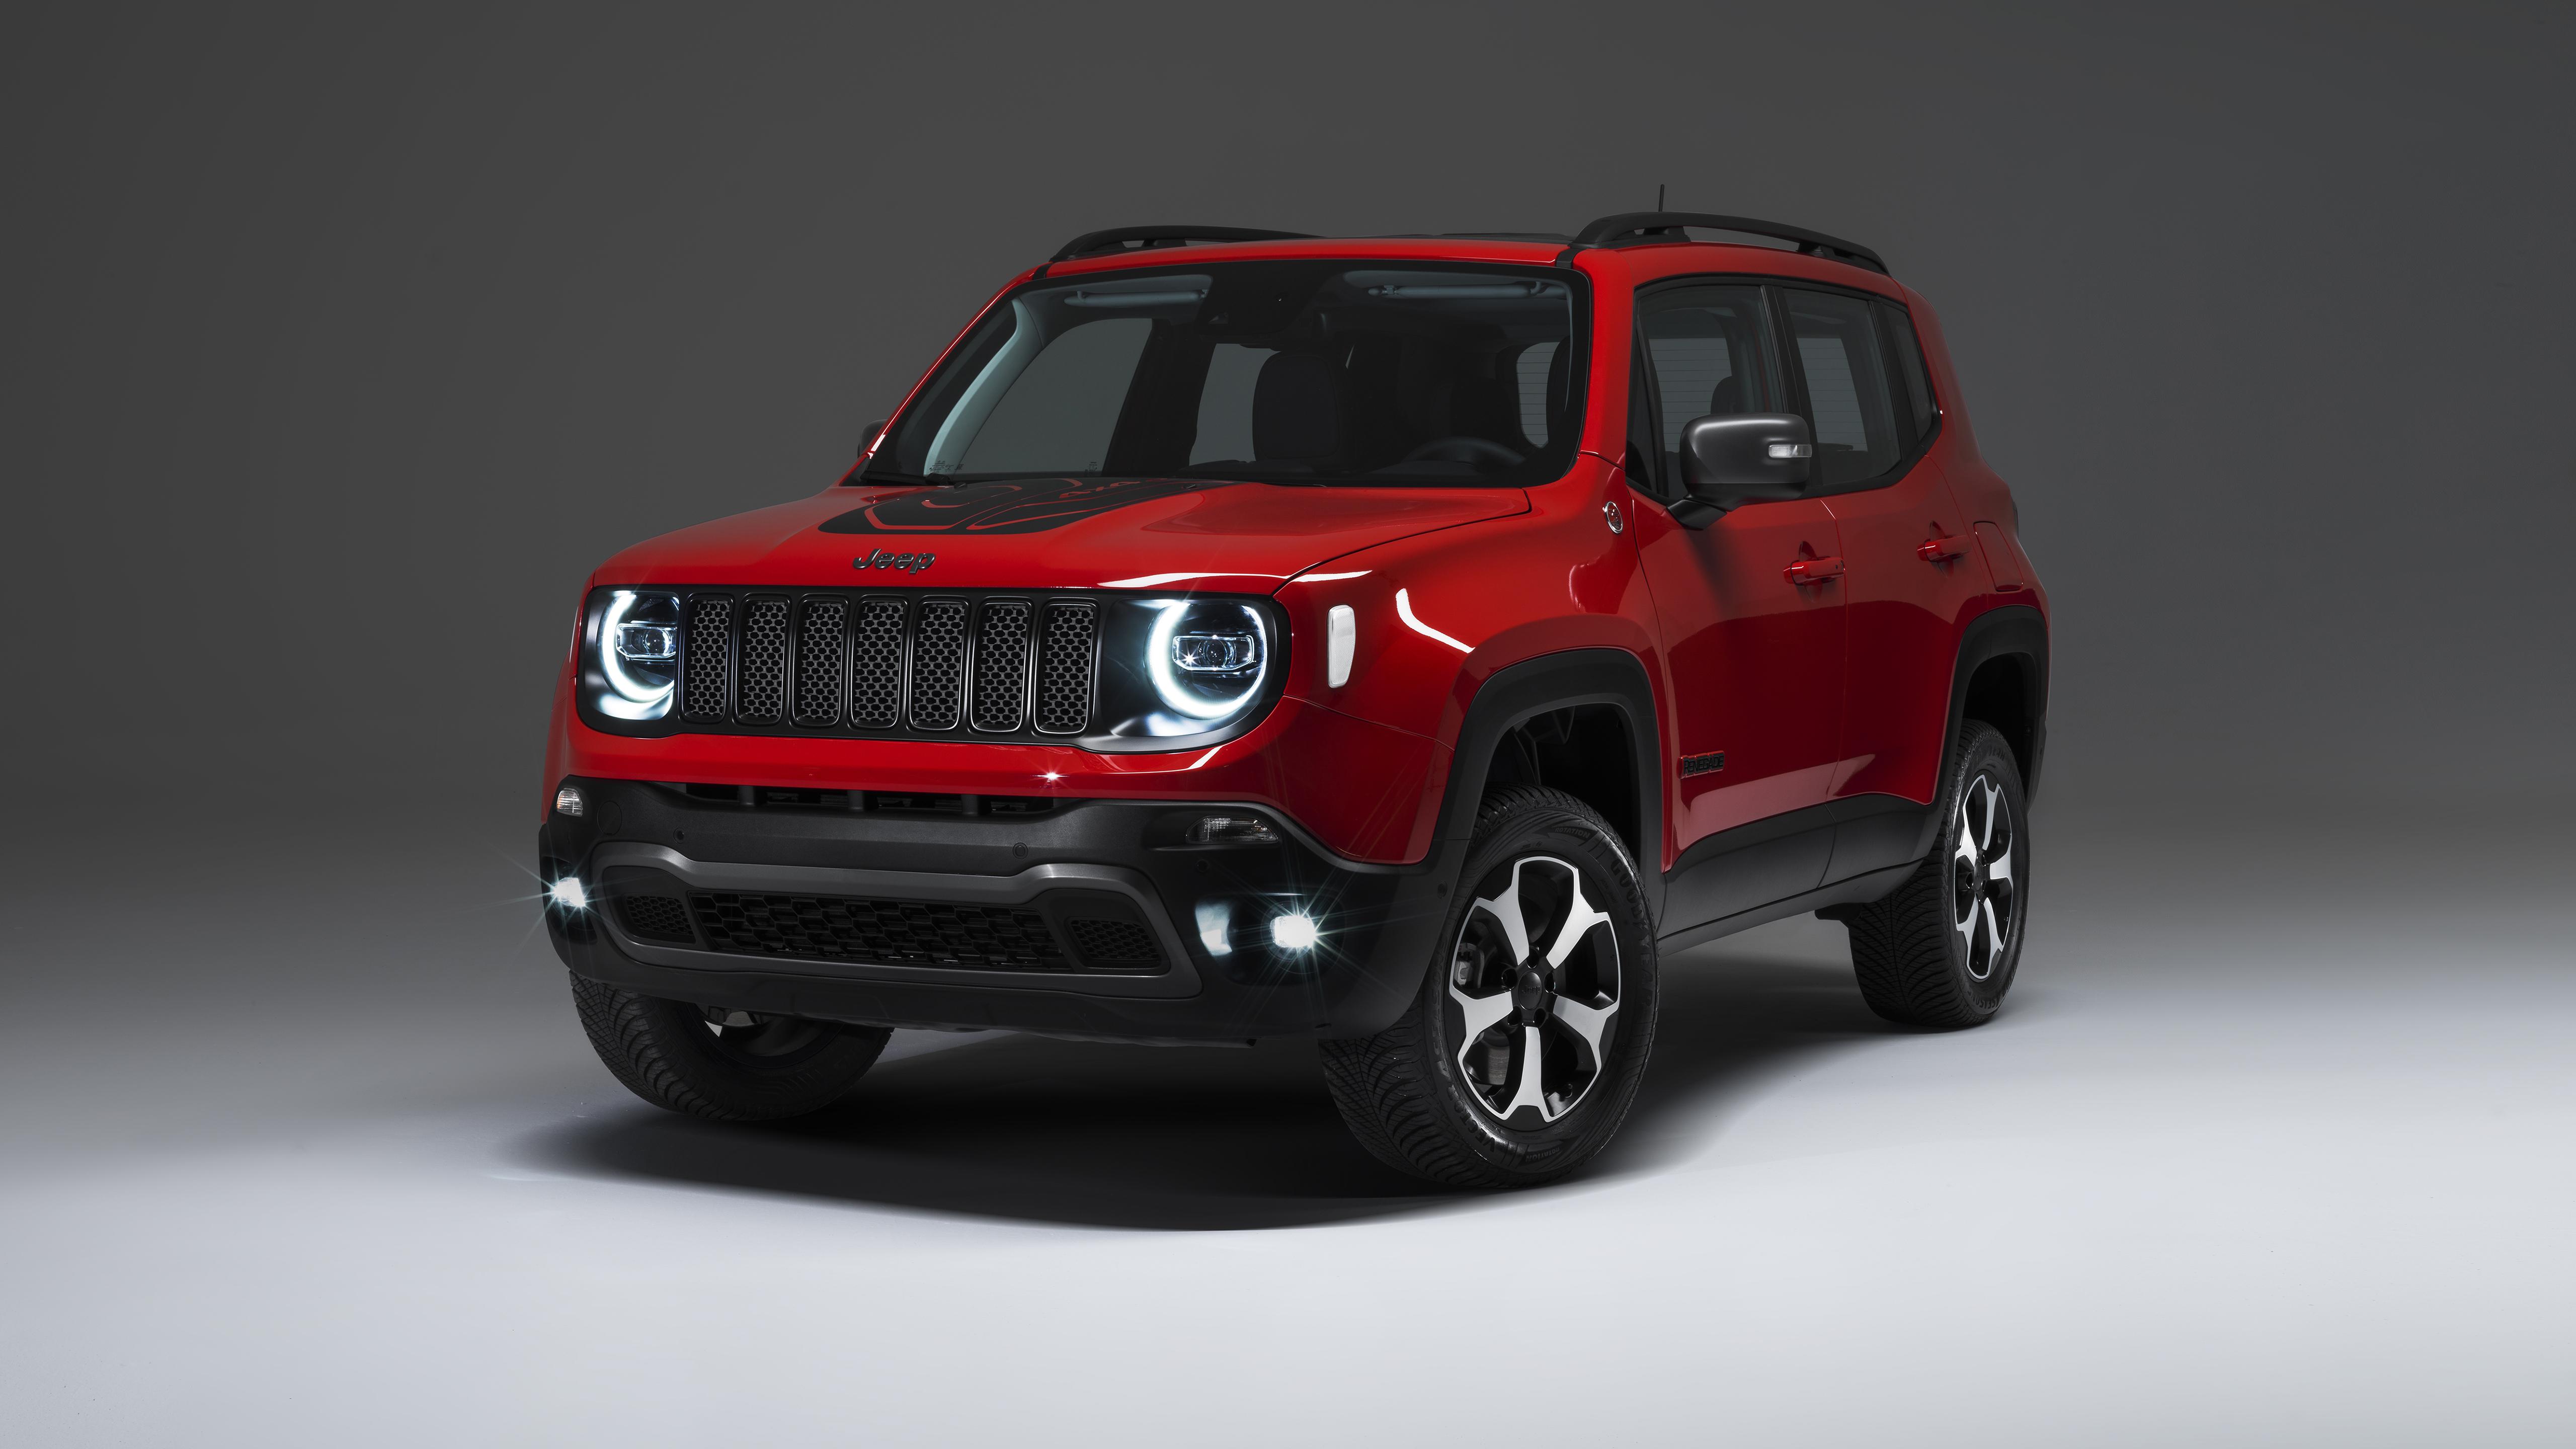 Jeep Renegade Plug in Hybrid 2019 4K Wallpaper   HD Car ...